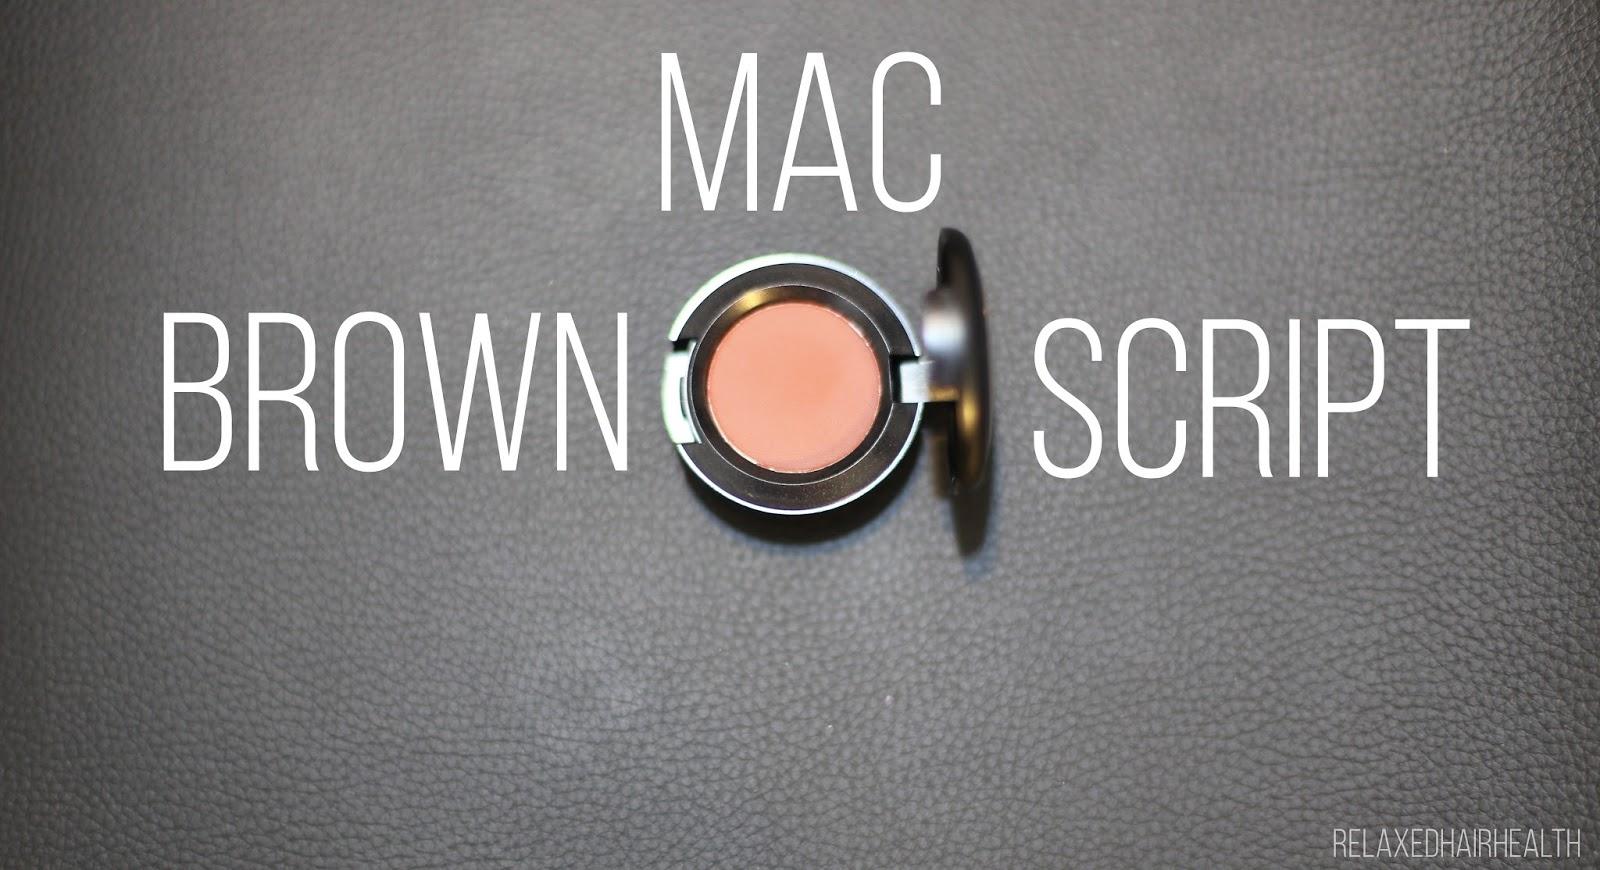 MAC Brown Script